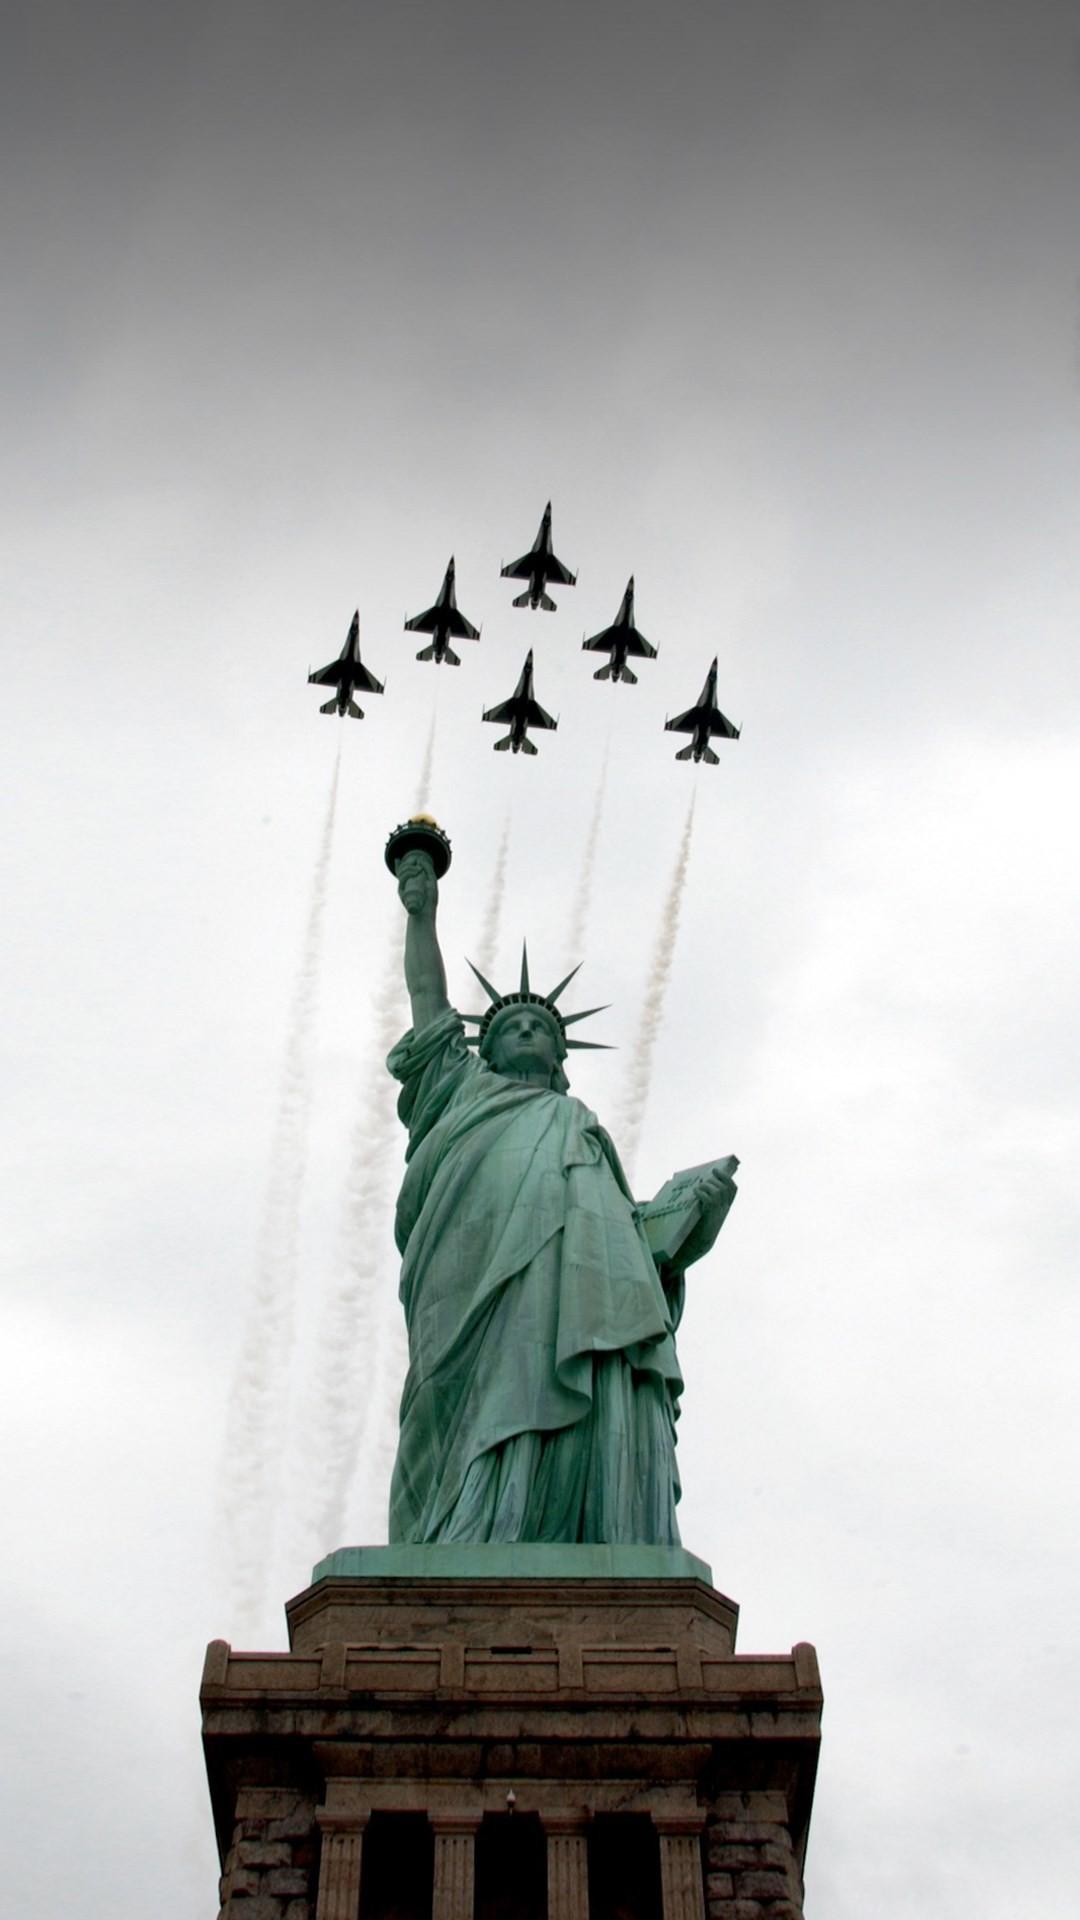 us air force iphone wallpaper …